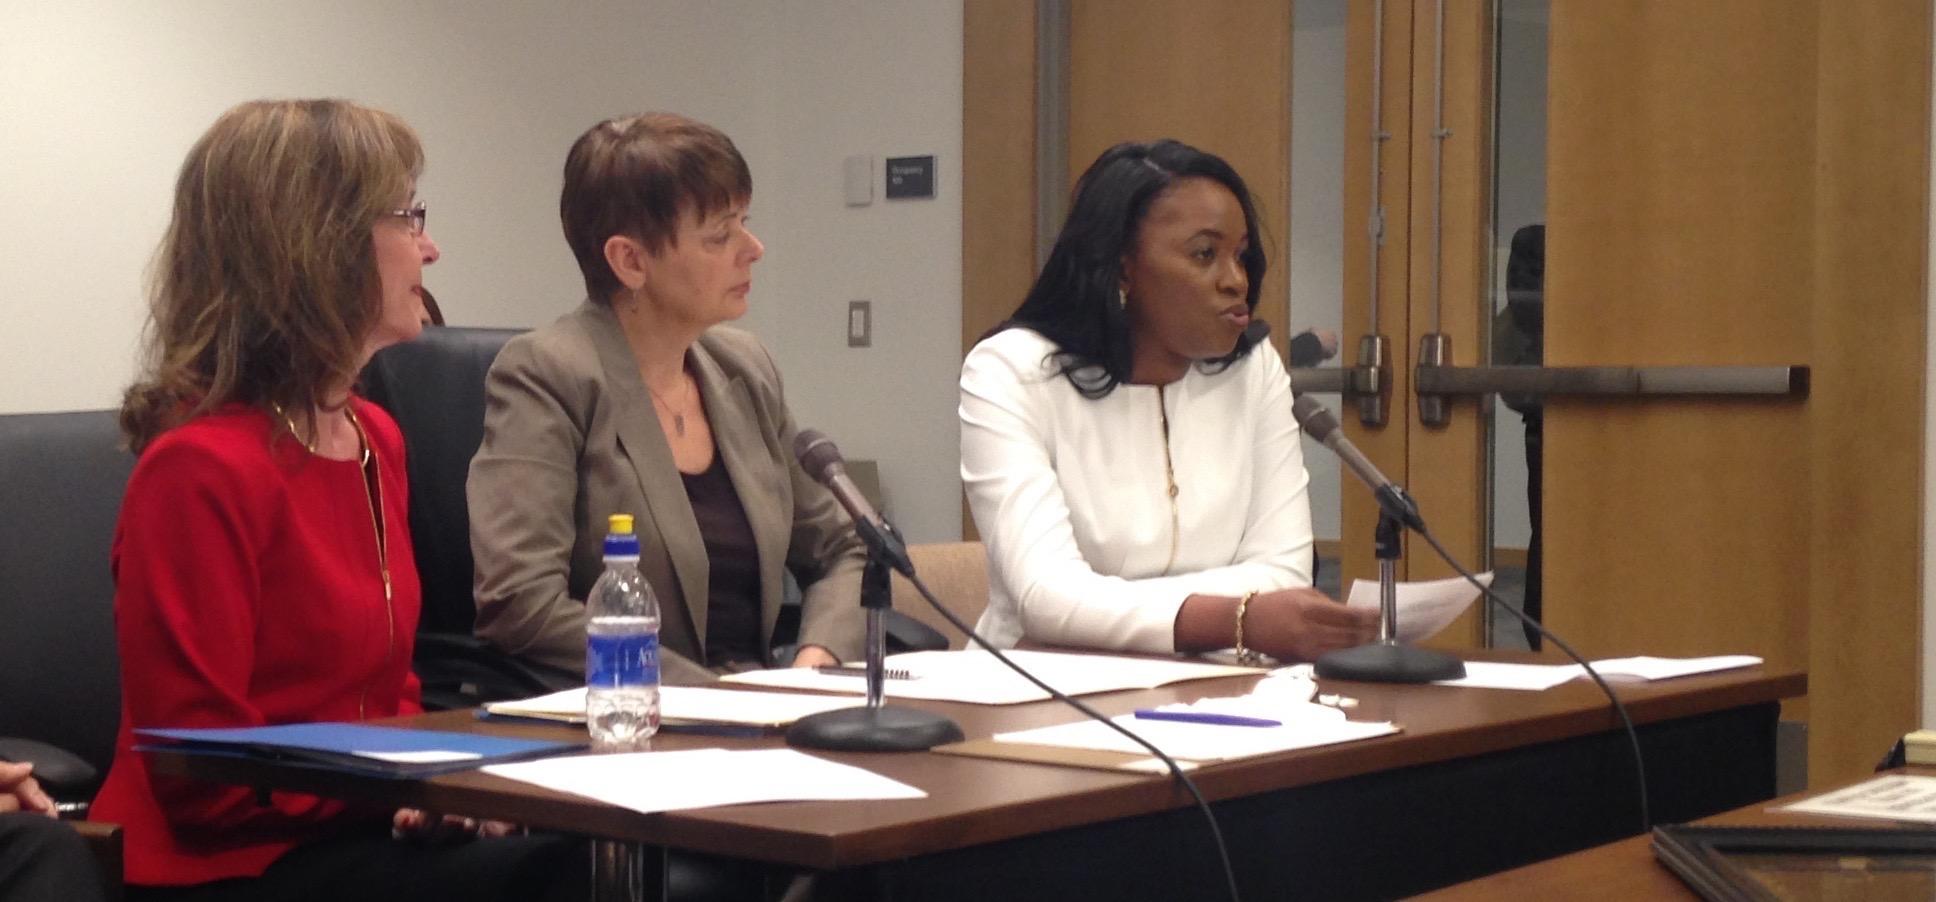 Dr. Edwige Mubonzi testifying with Dr. Ellen Kennedy (far left) and Senator Sandra Pappas (Middle)